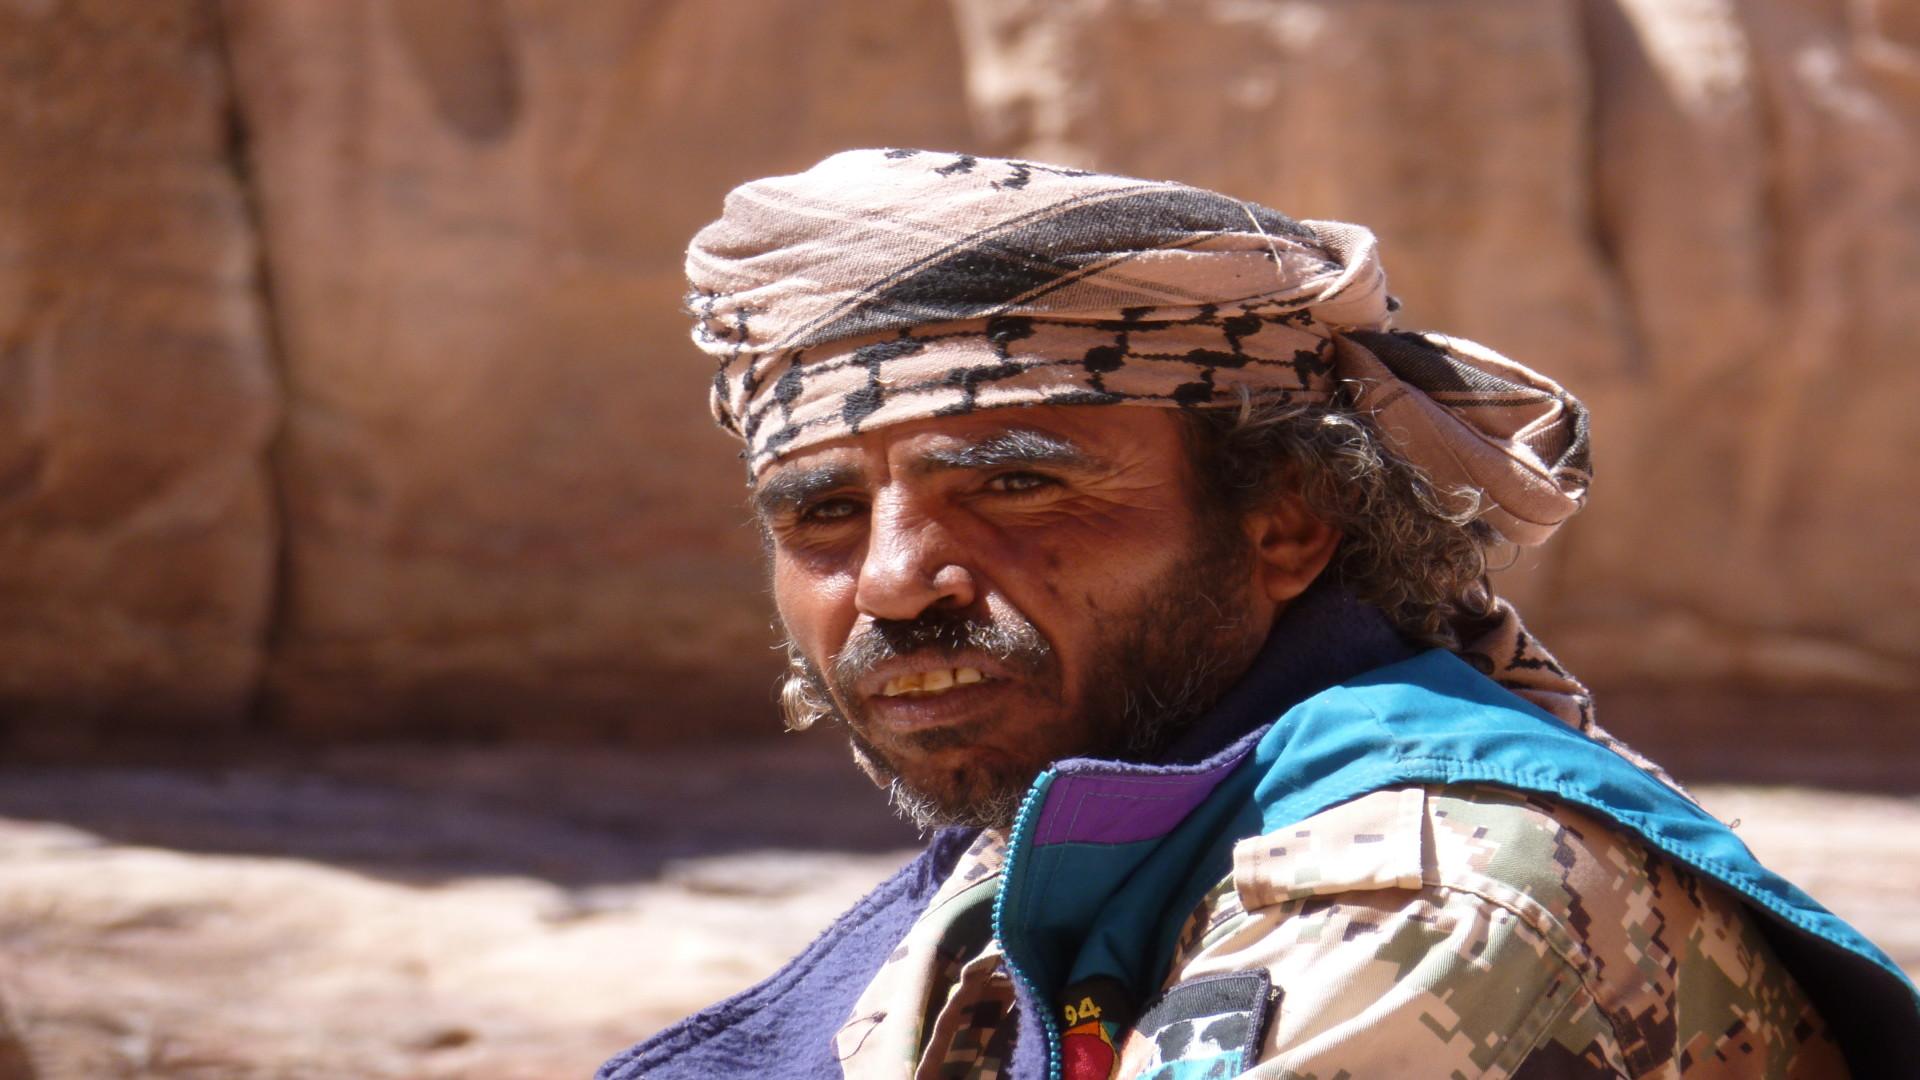 Jordaanse man, Jordanië